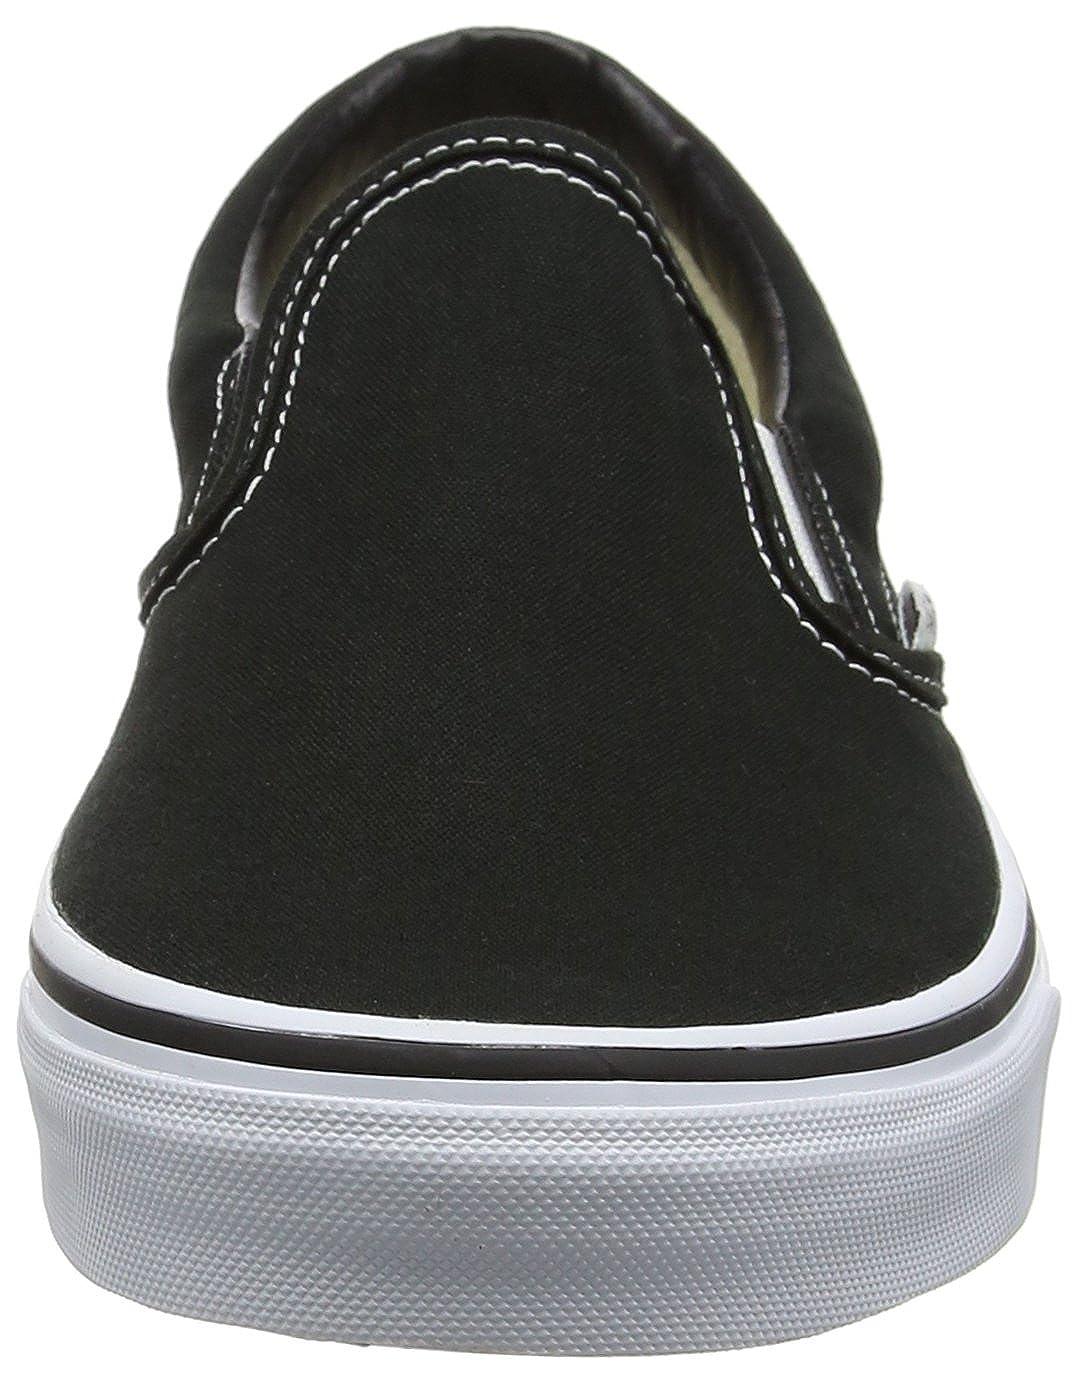 Vans Vans Vans Unisex-Erwachsene Classic Slip-on Canvas Low-Top weiß D(M) 4732fd